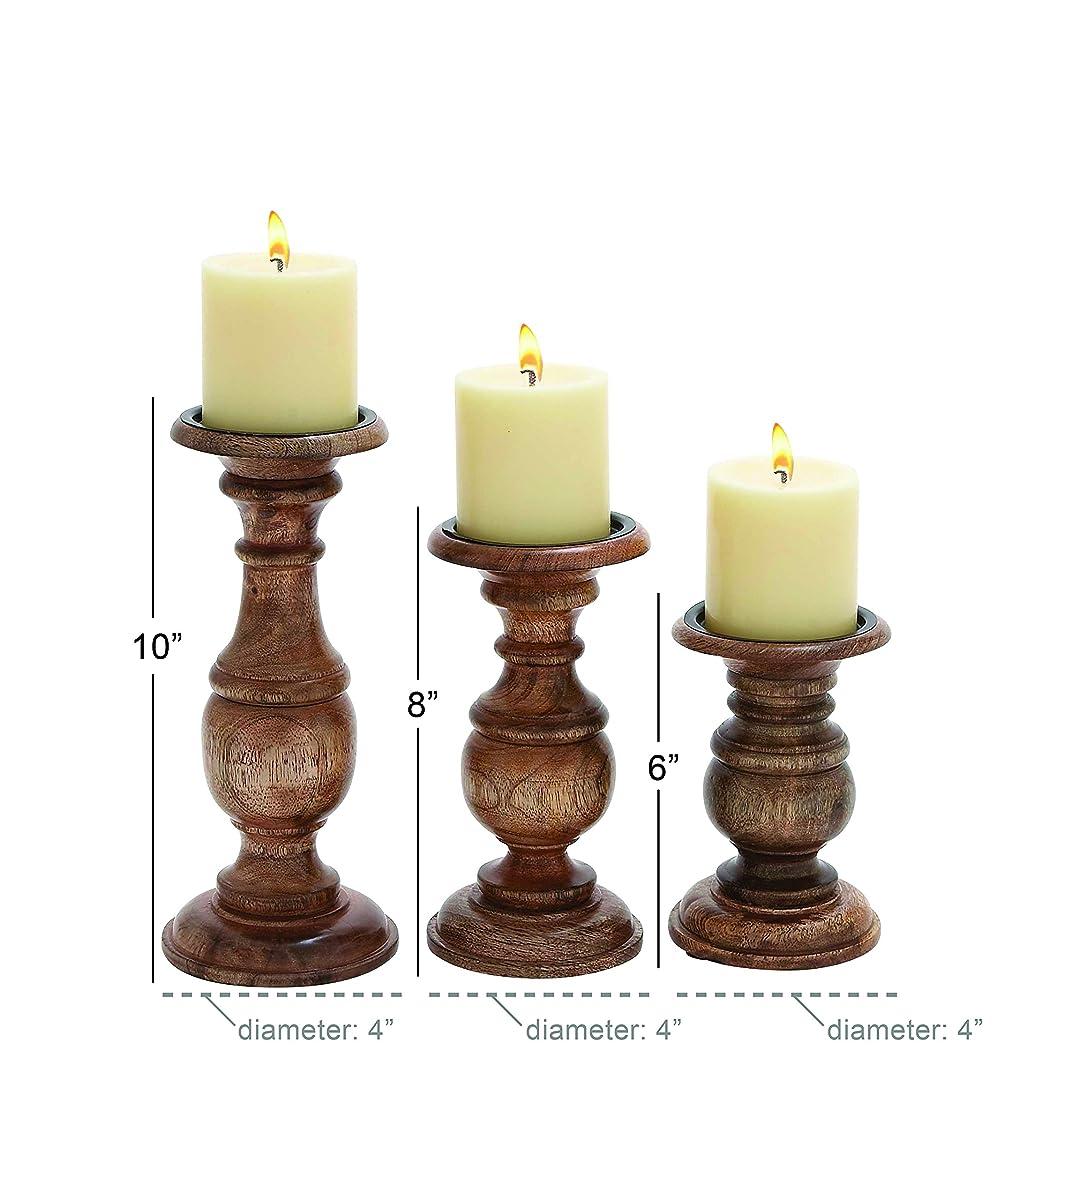 "Deco 79 51536 Wood Candle Holder (Set of 3) 10"", 8"", 6"" H"